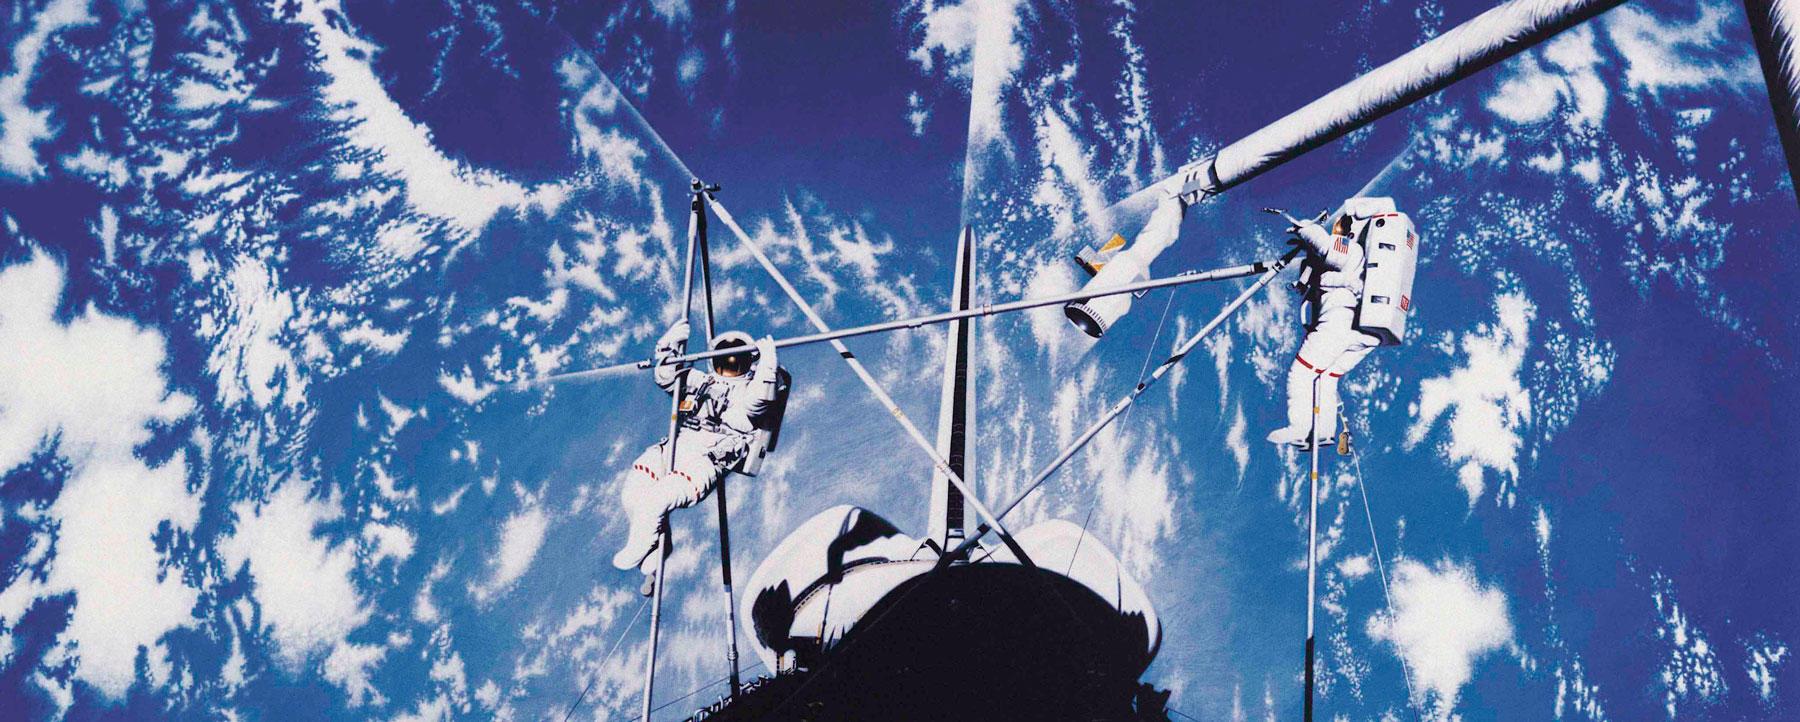 Astronauts assembling a station.